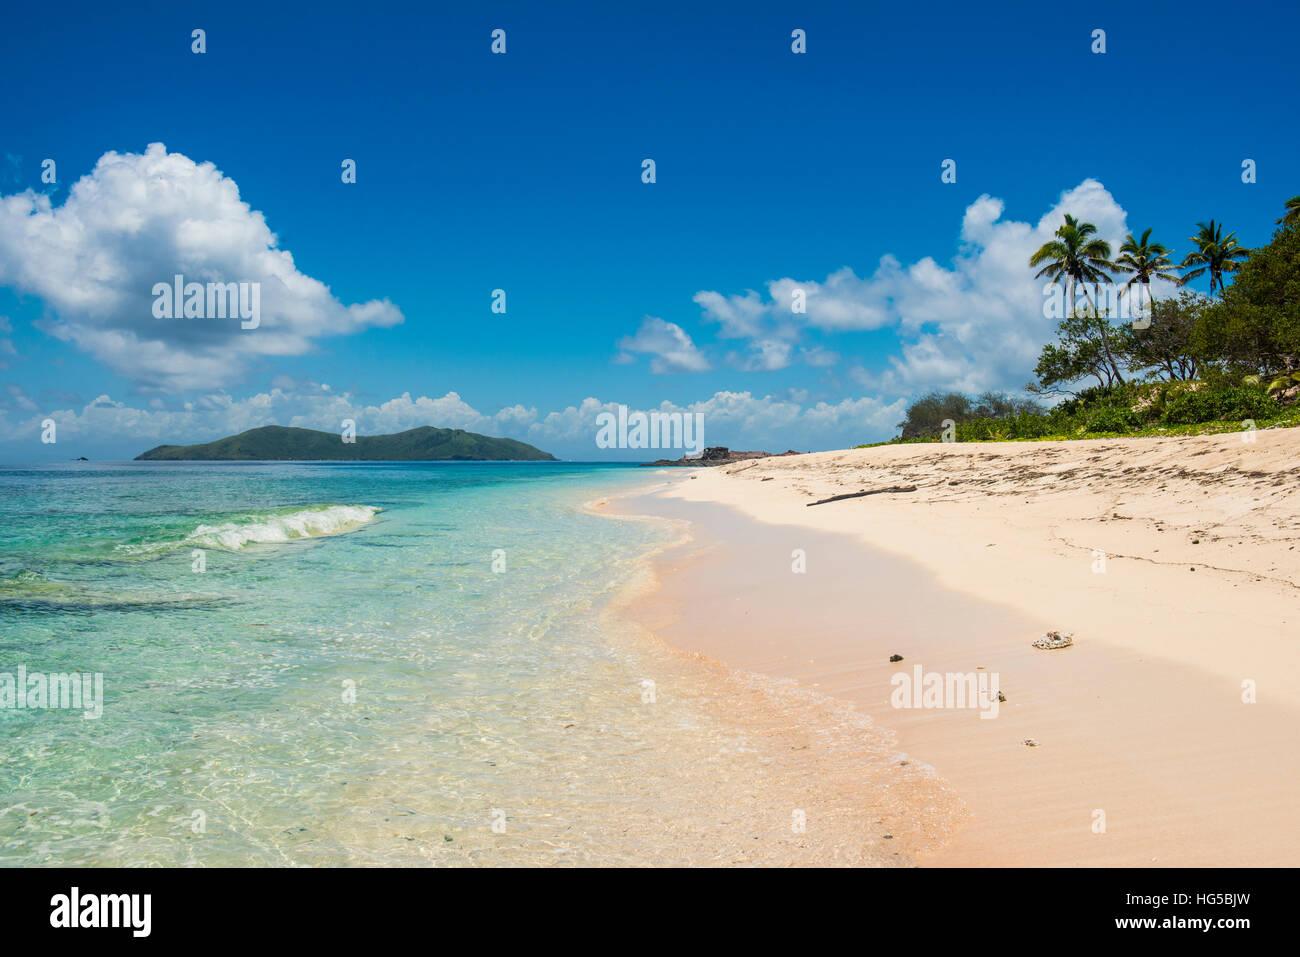 Schönen weißen Sandstrand auf Monuriki (Cast Away Insel), Mamanuca Inseln, Fidschi-Inseln, Süd-Pazifik Stockbild